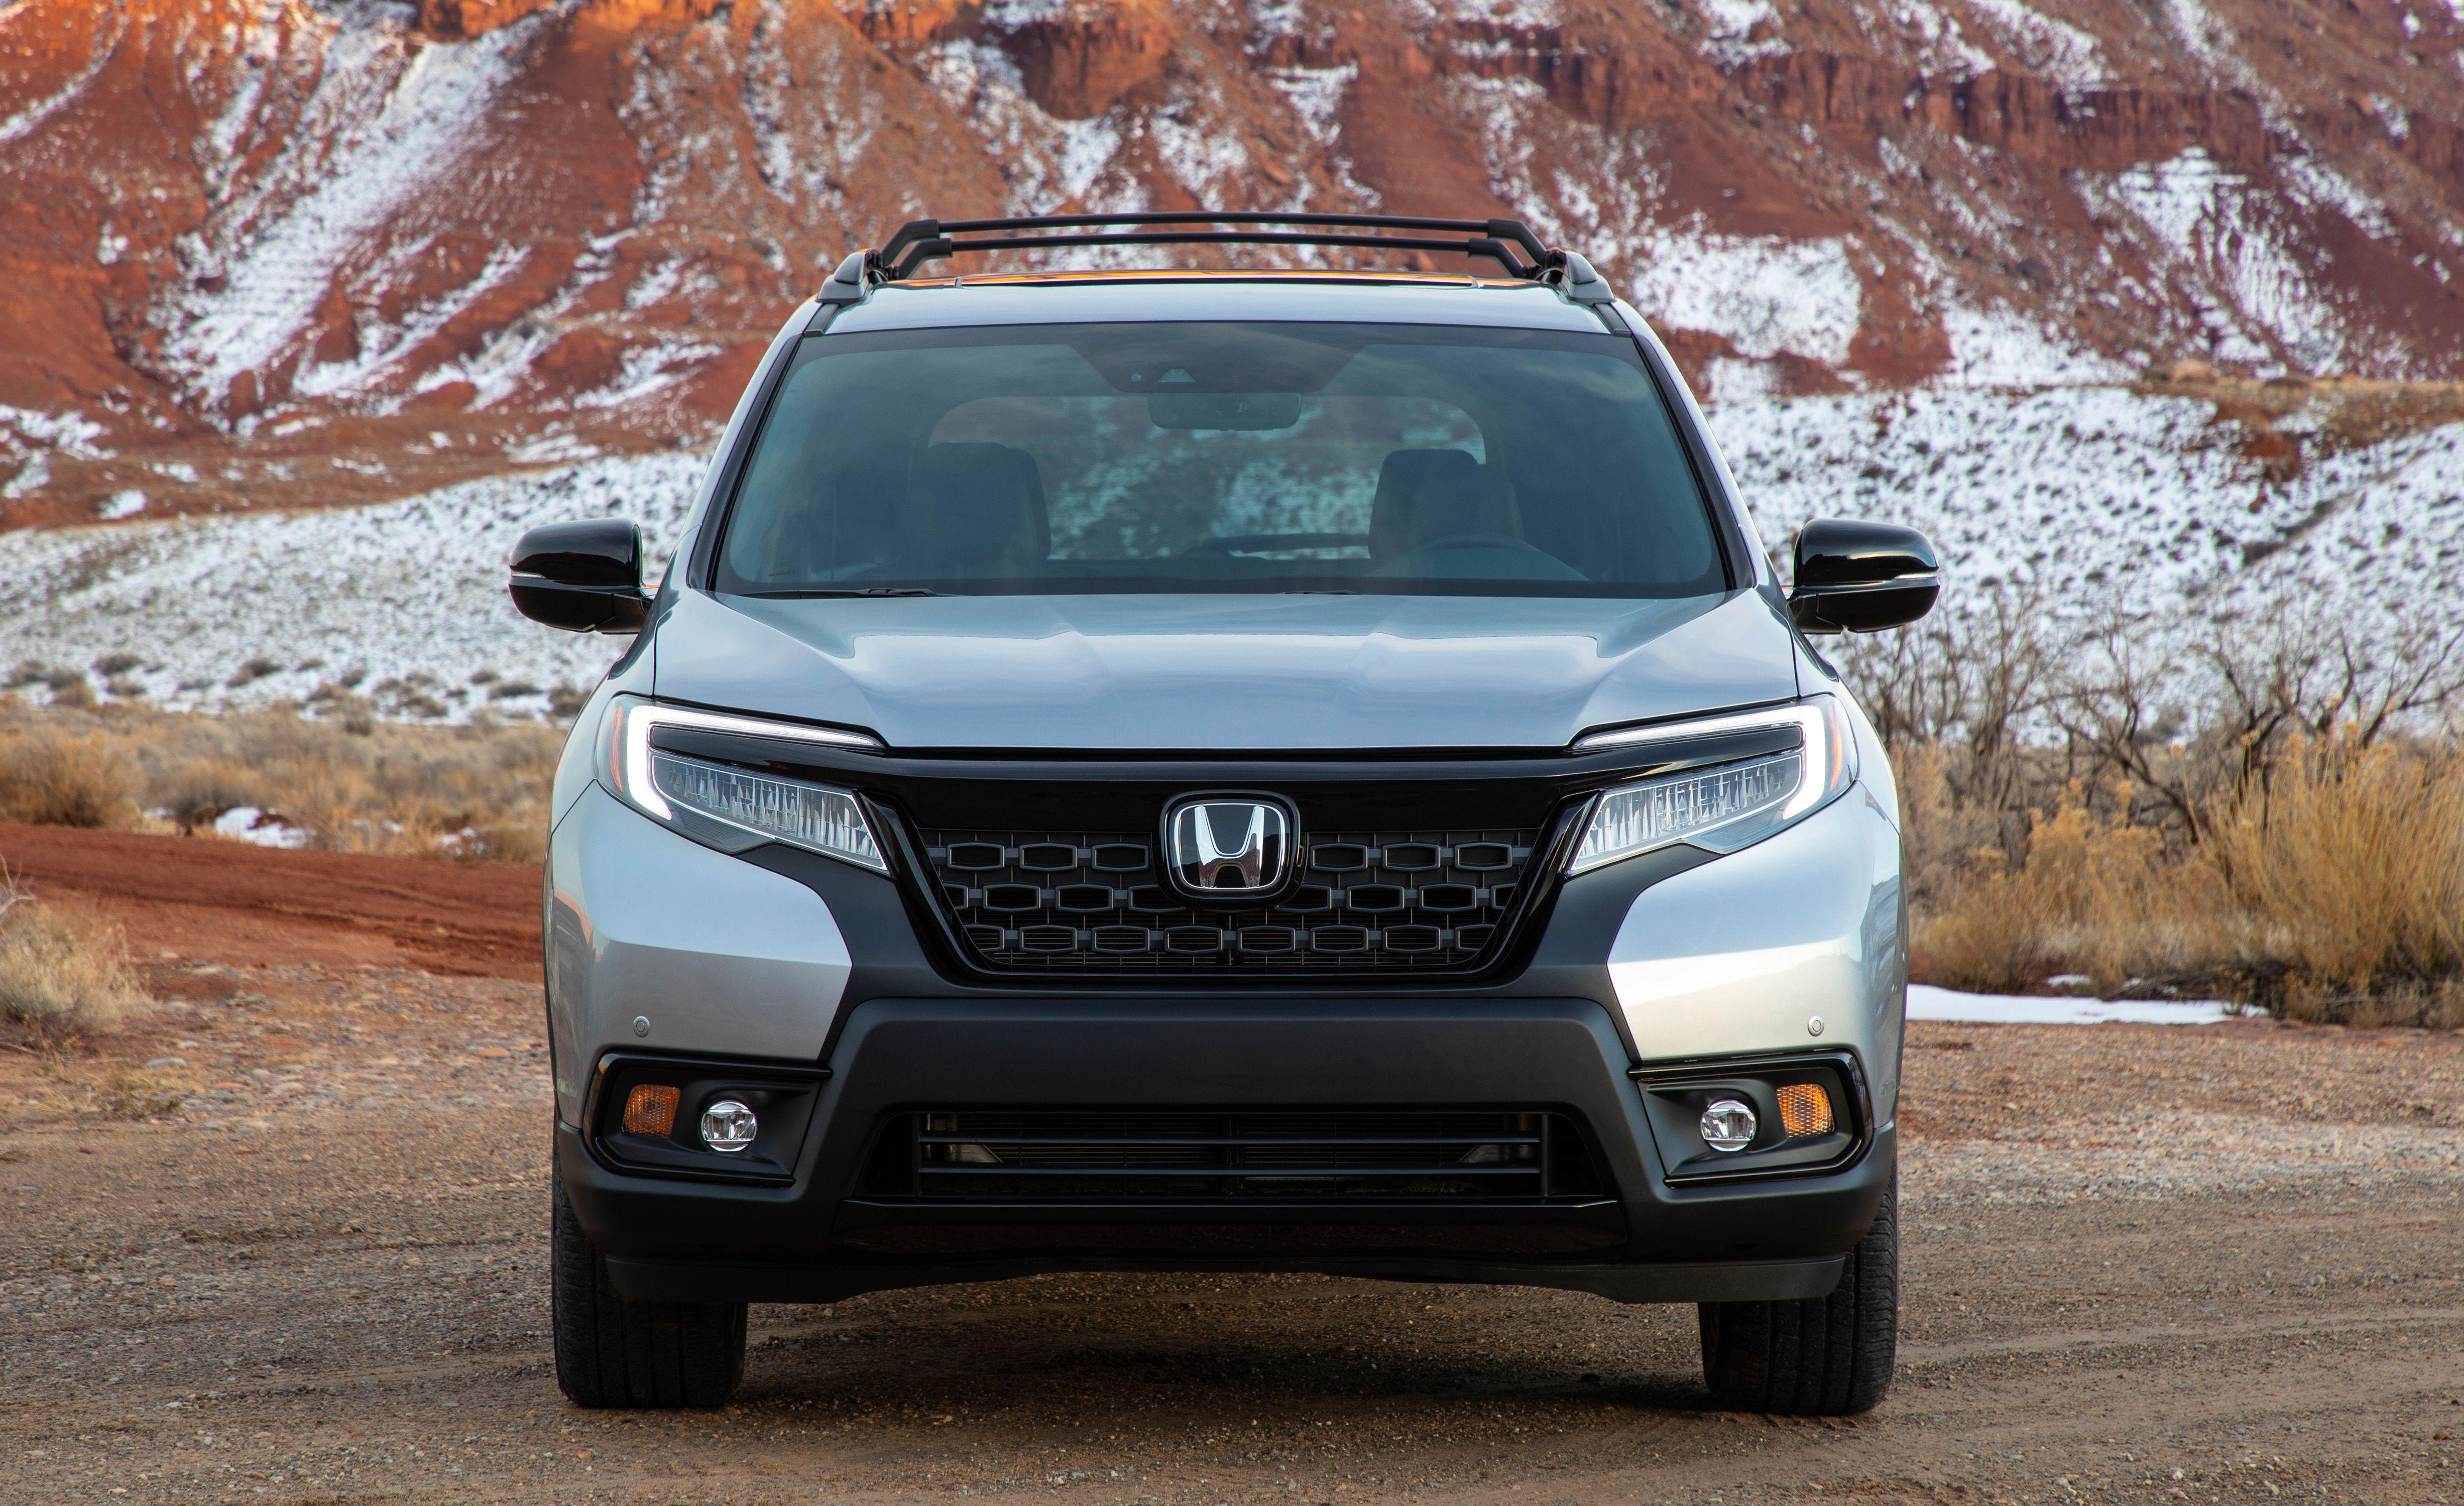 2019 Honda Passport Reviews Honda Passport Price Photos And